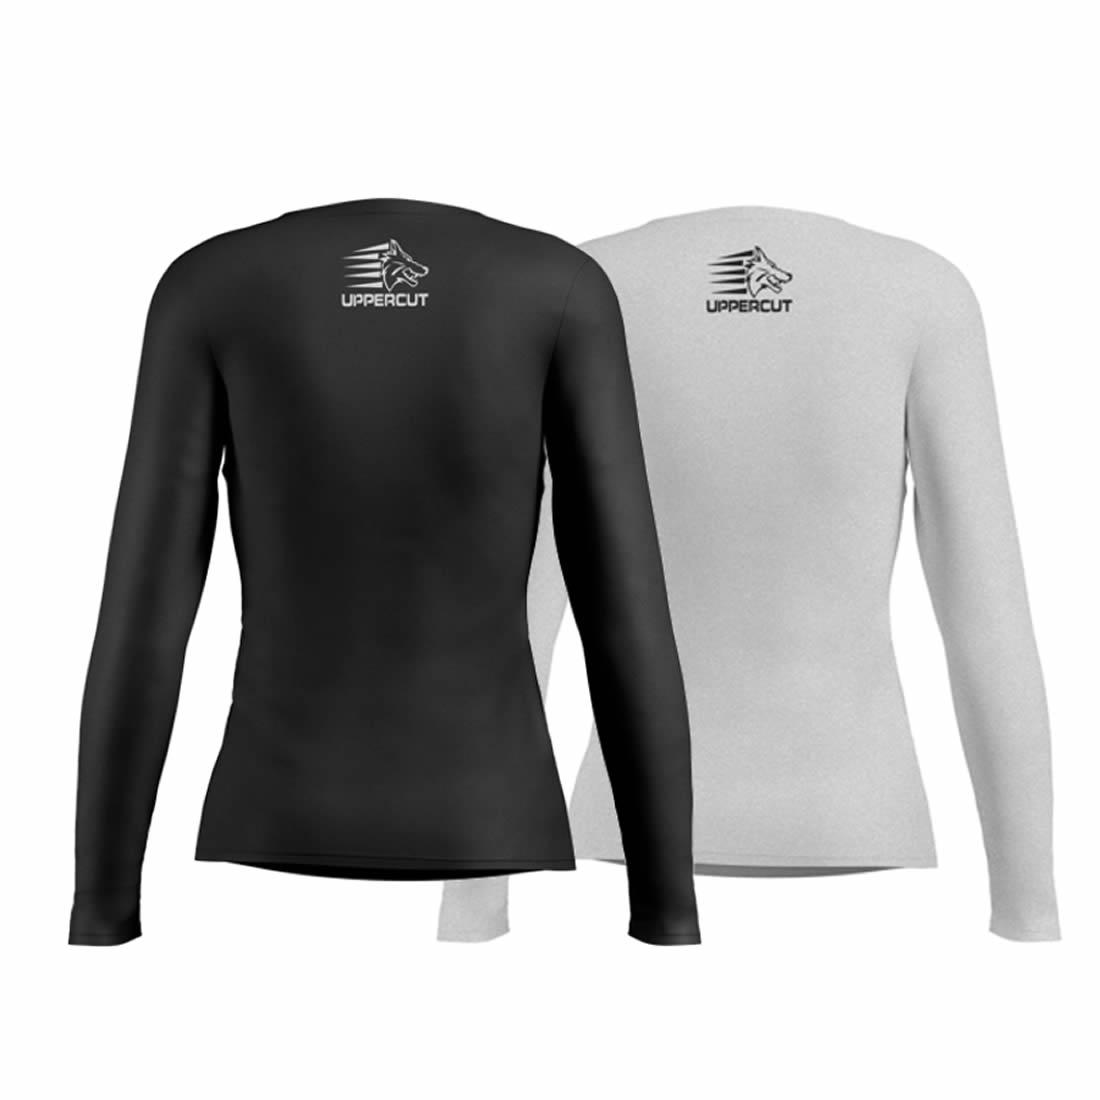 Kit 2 Camisas UV-50+ - Corrida Running Feminina - Kt12